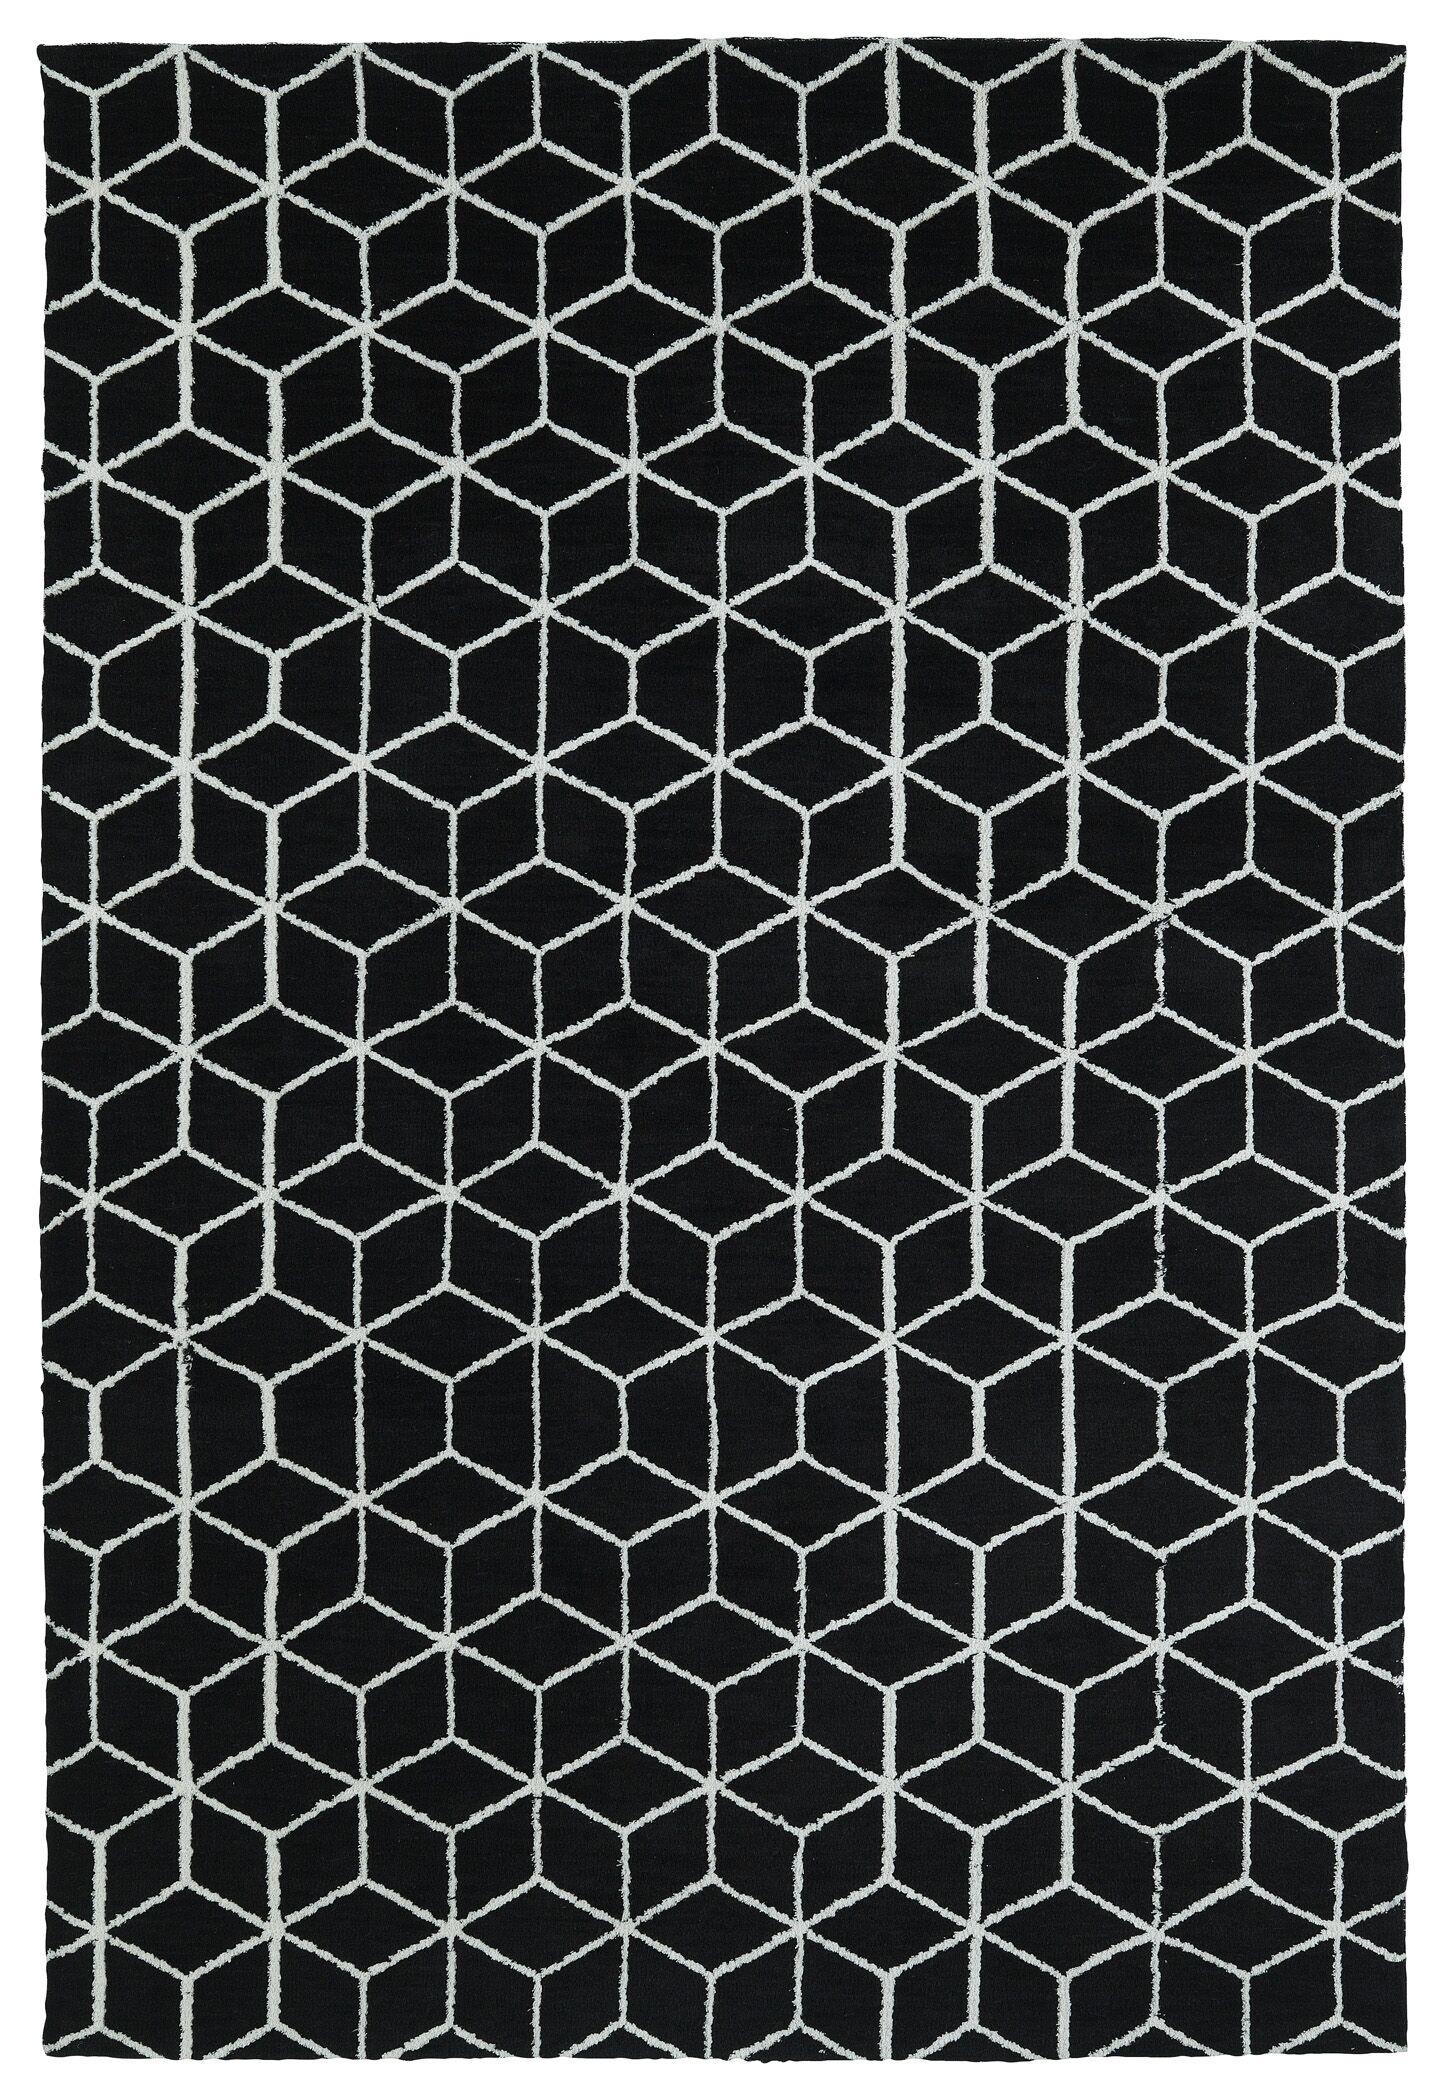 Gannaway Black Area Rug Rug Size: Rectangle 5' x 7'